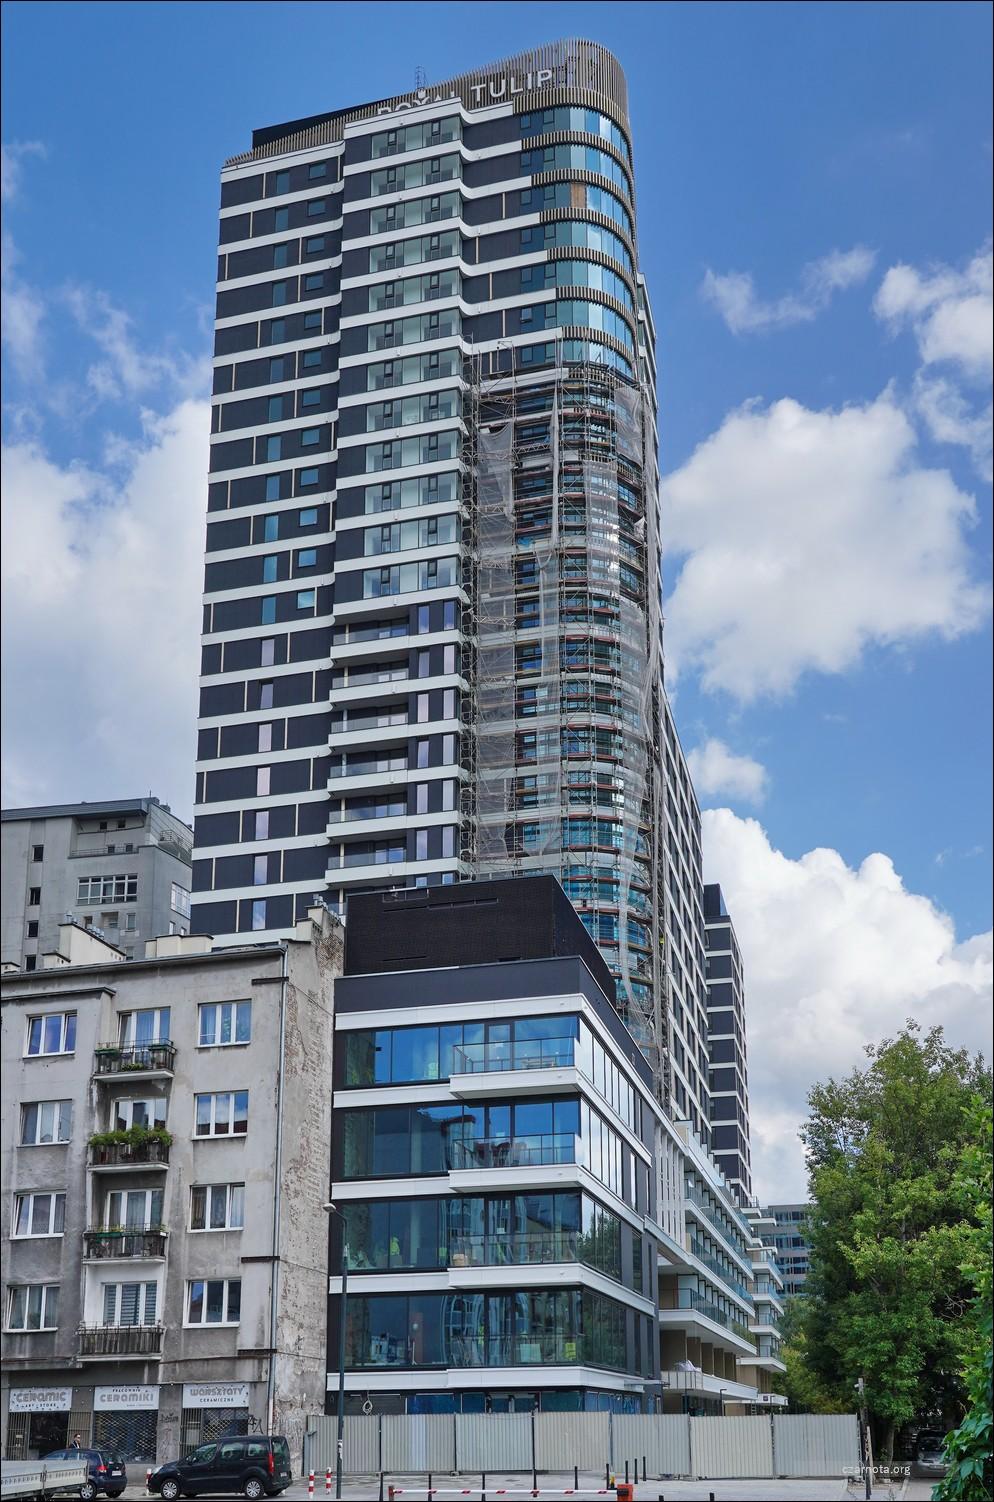 Warszawa, ul. Grzybowska 49, Royal Tulip Warsaw Apartments.